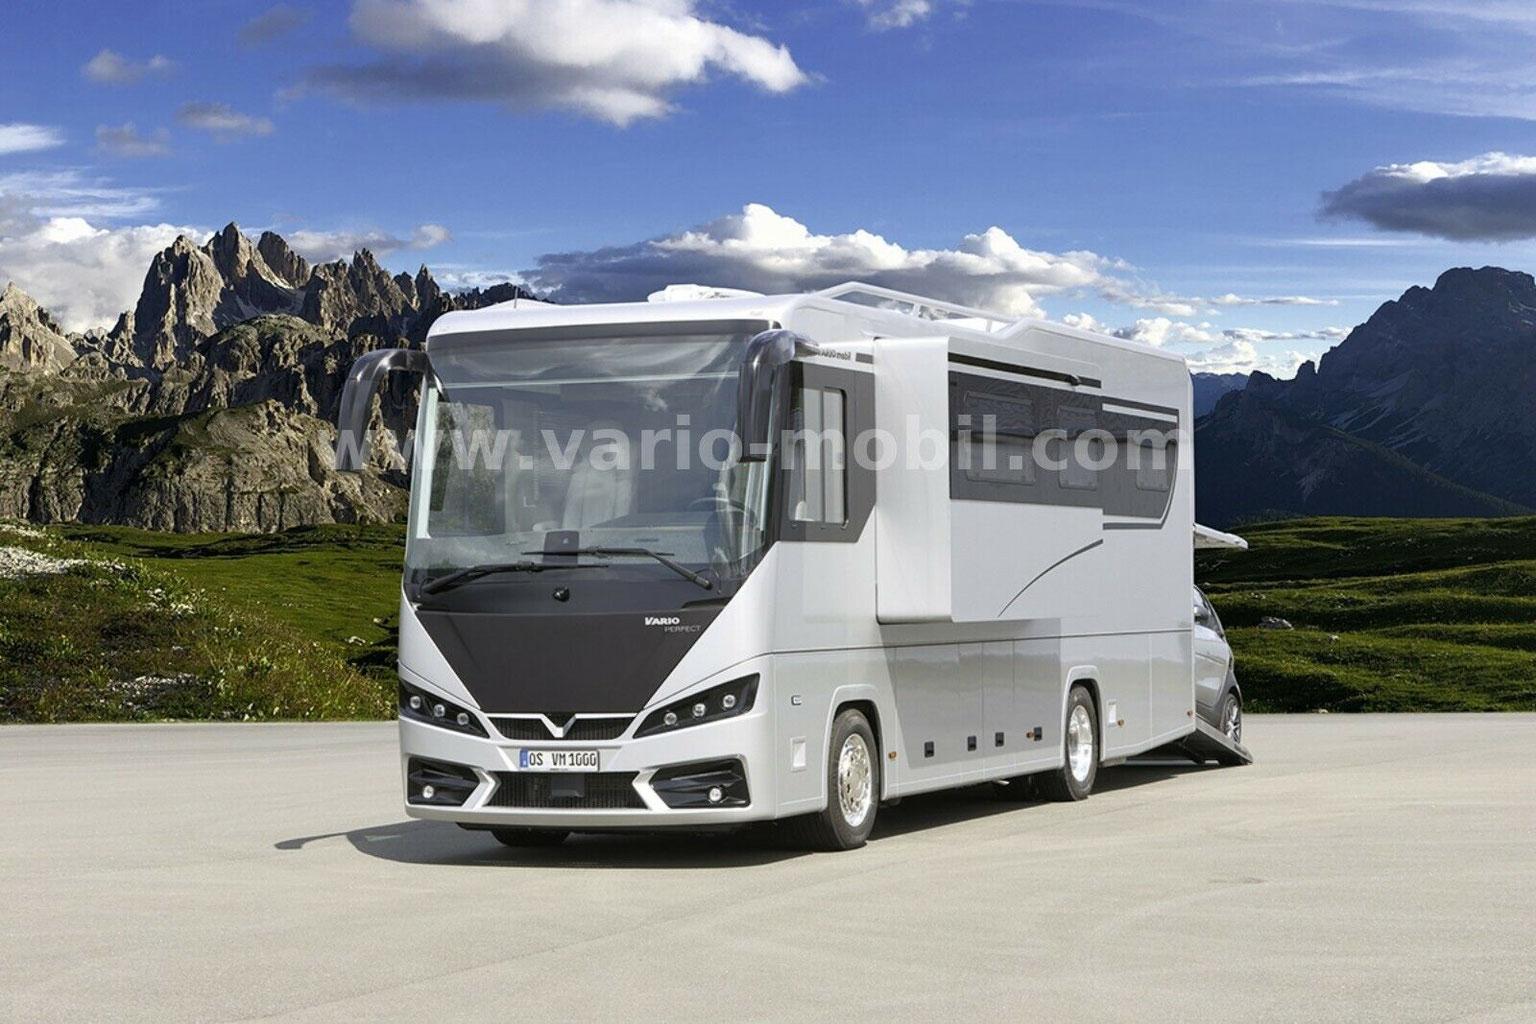 Neufs - Prestige Camping-Cars concernant Camping Car De Luxe Avec Piscine